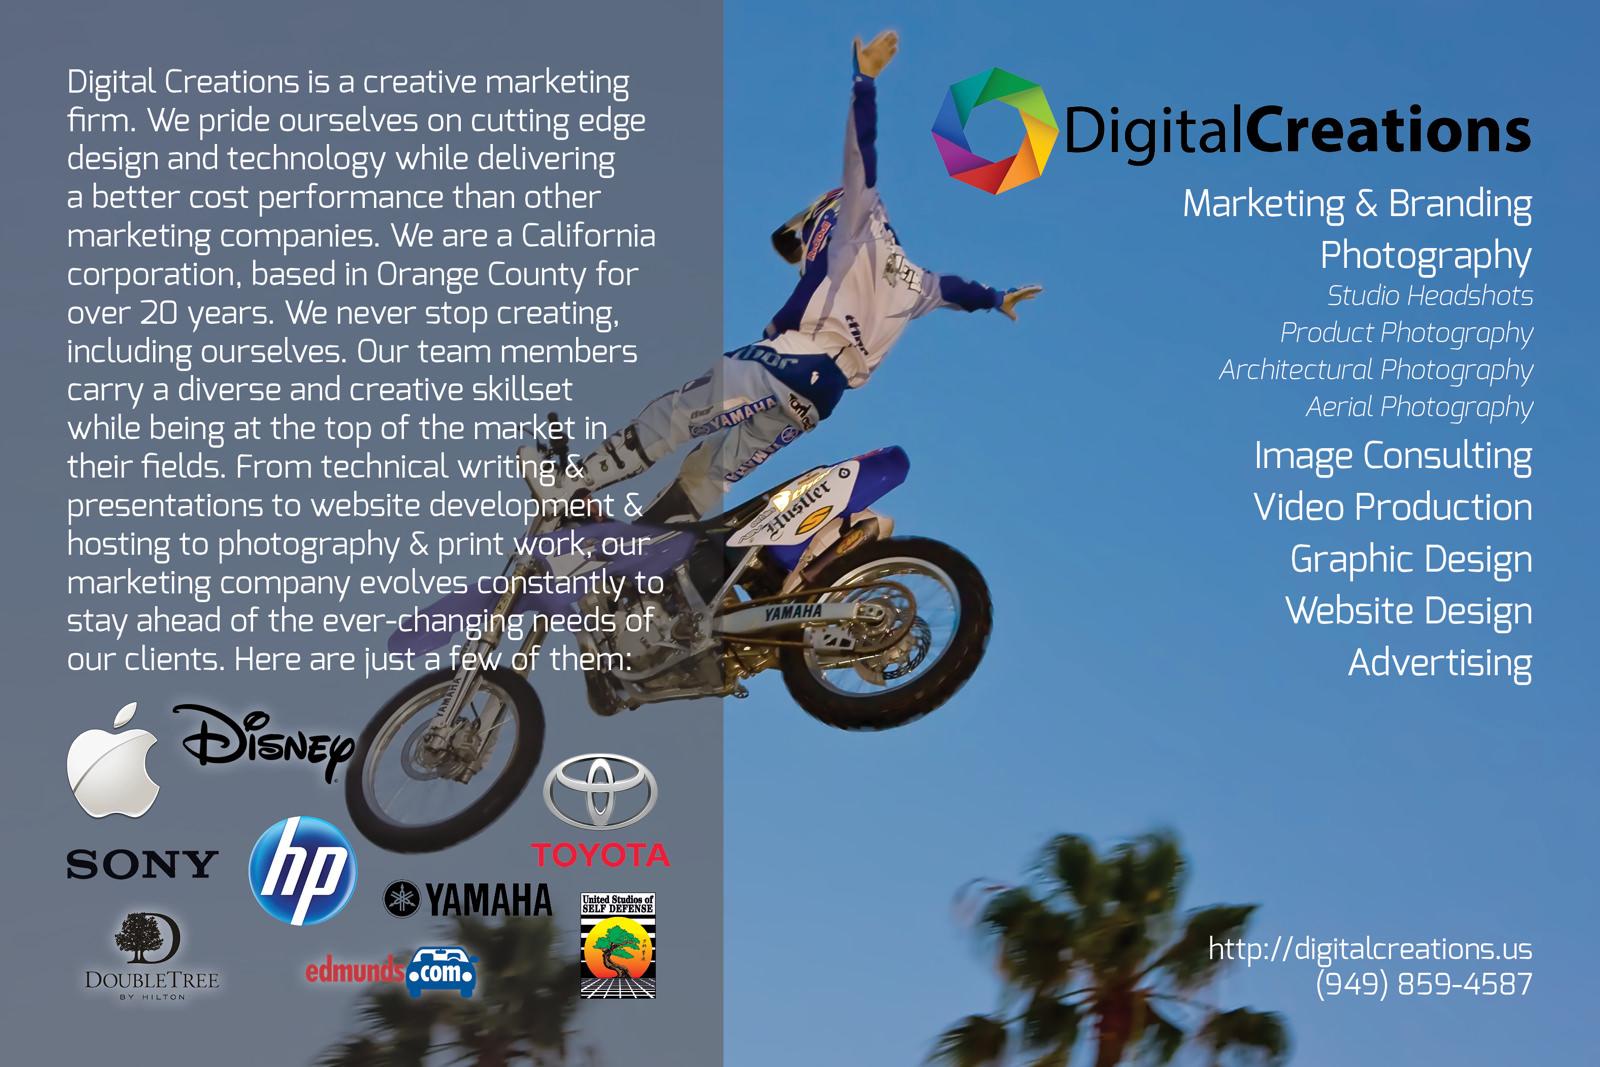 Digital Creations